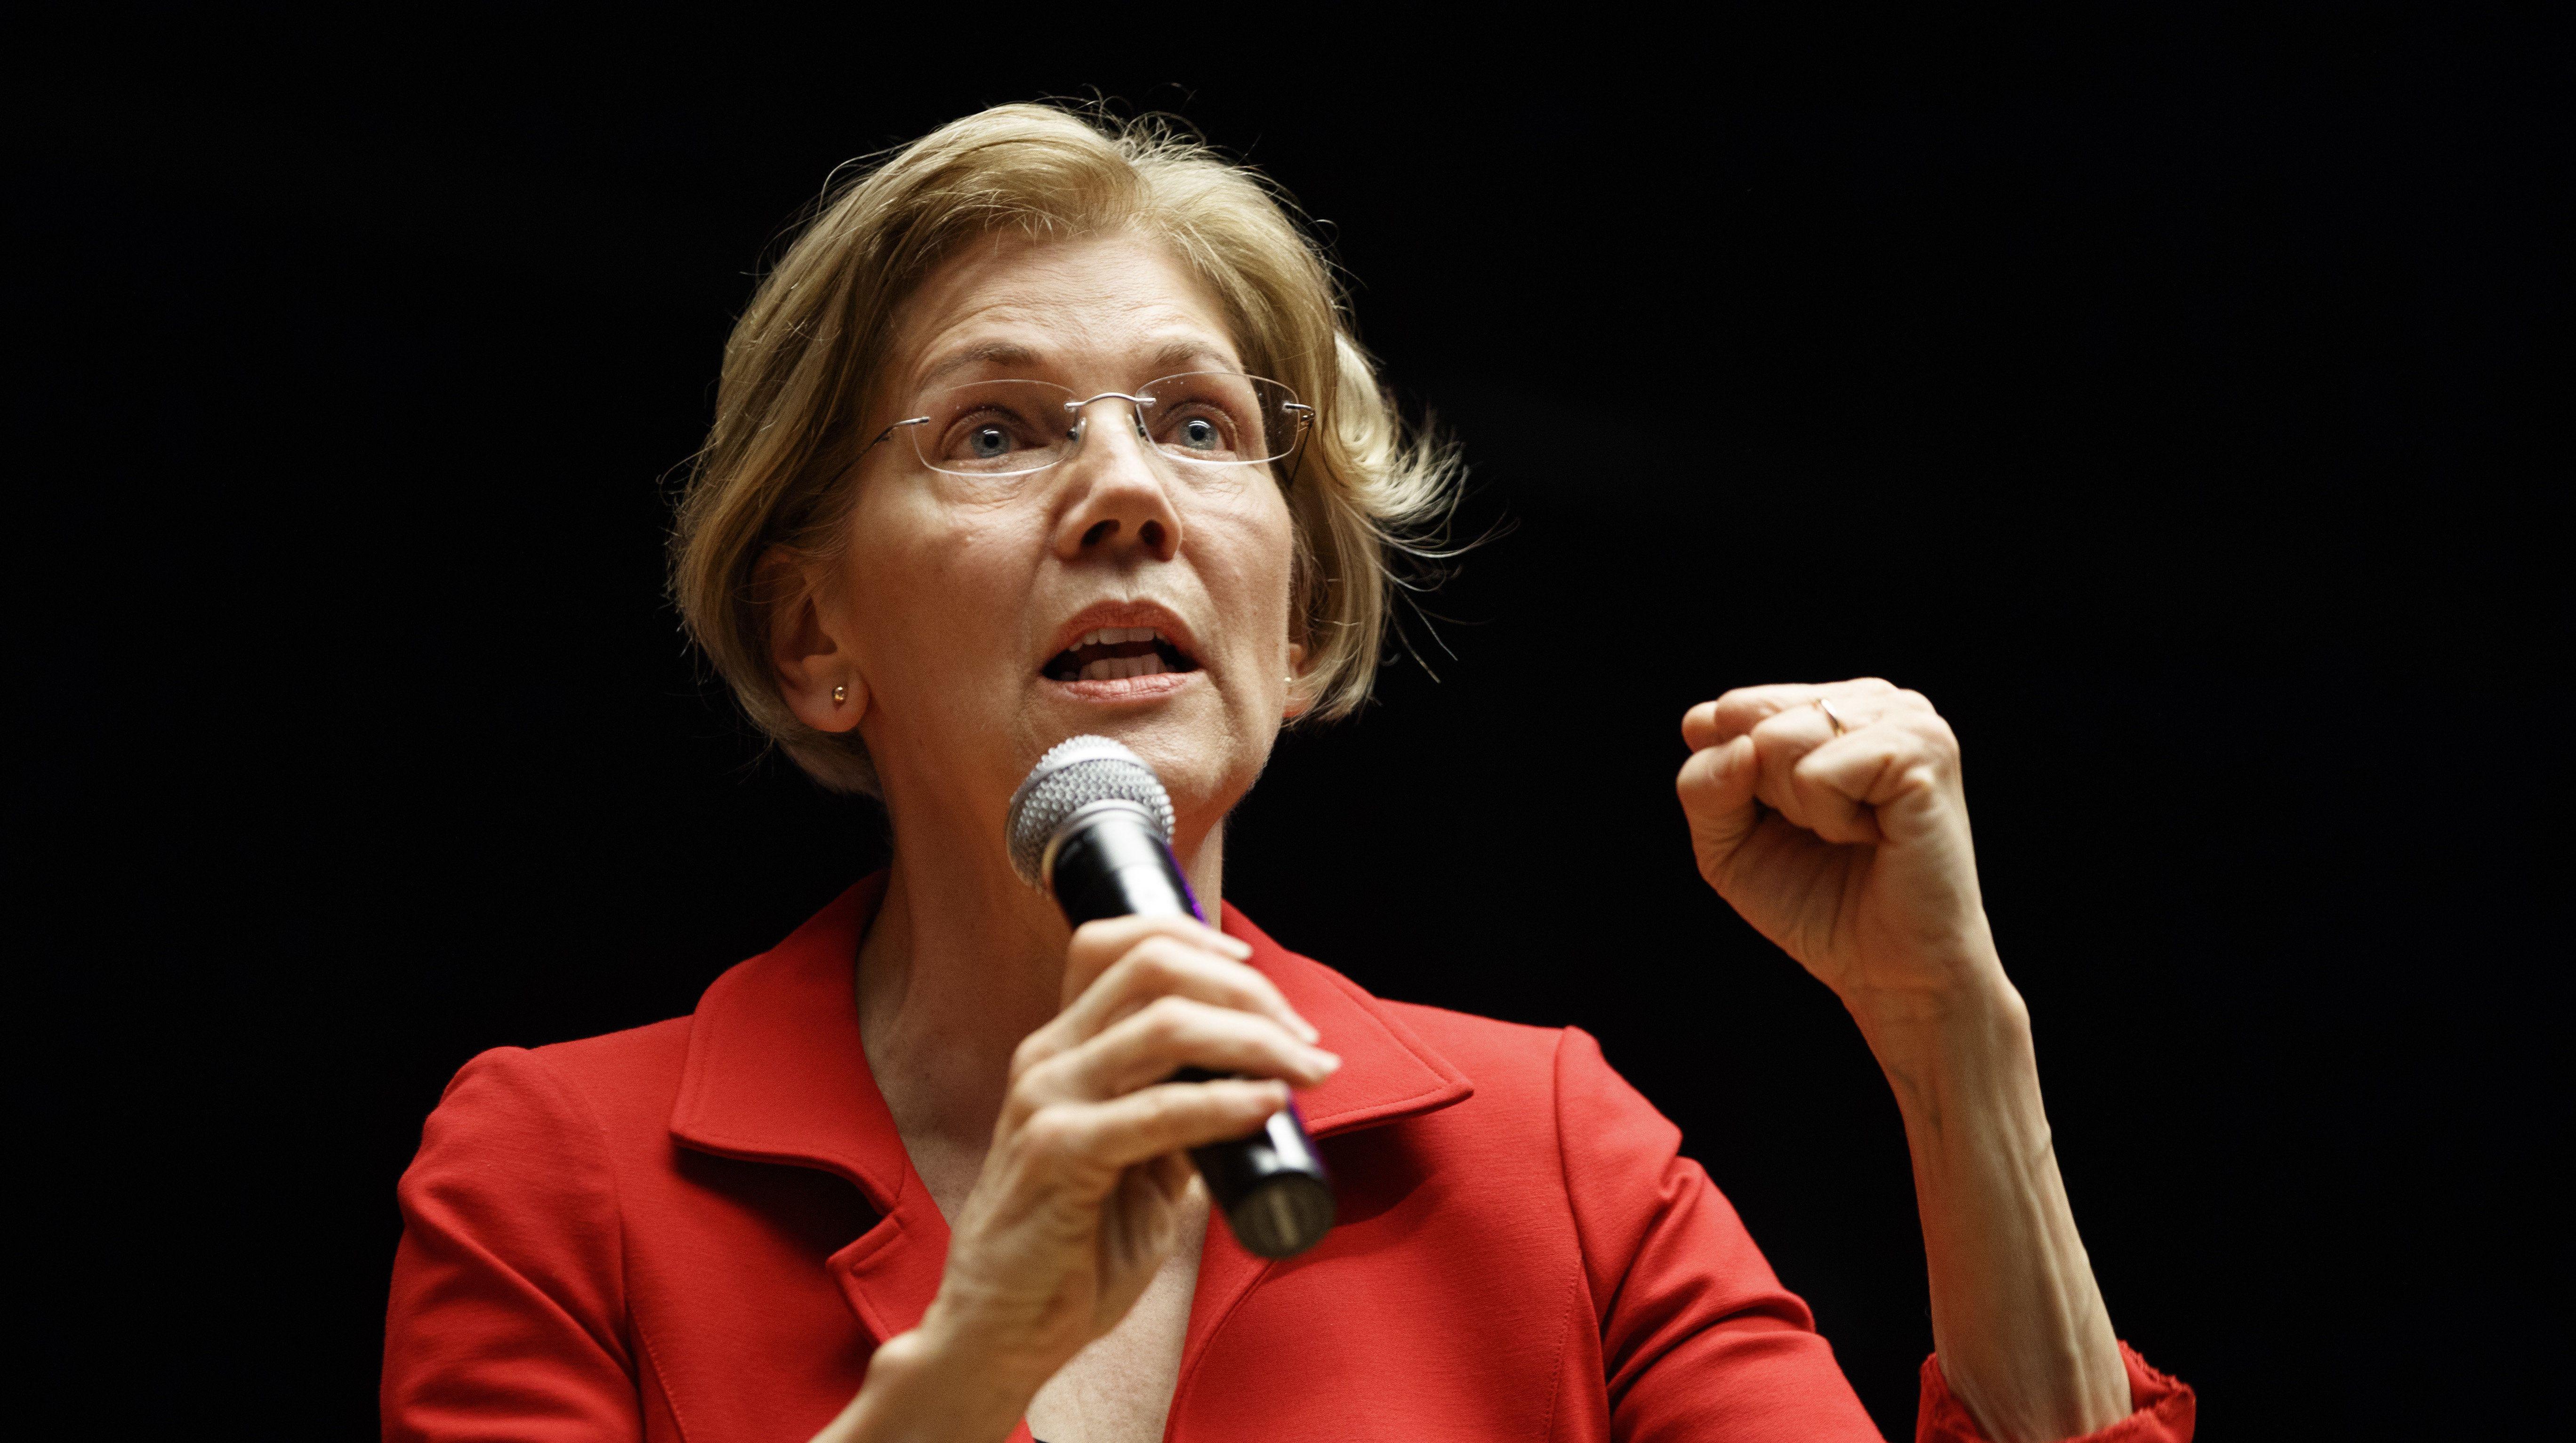 ICYMI Elizabeth Warren Gives Speech On 'Pocahontas' As